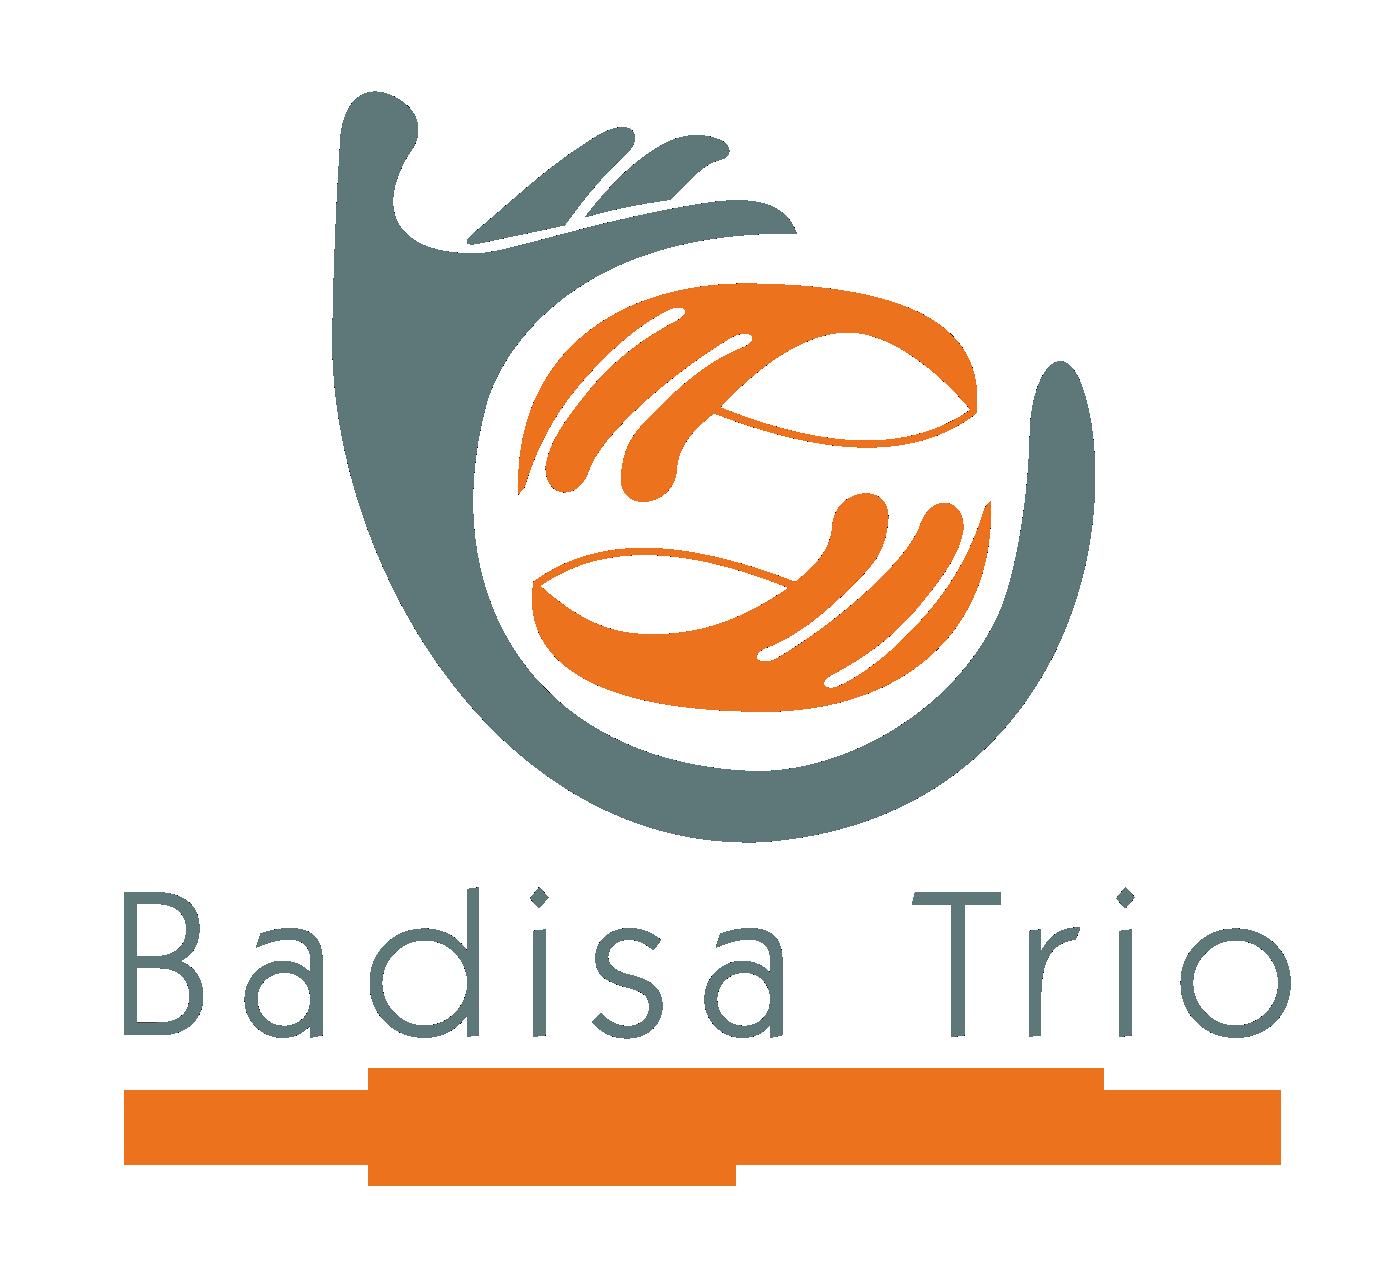 Badisa Trio - Child Protection Cape Town